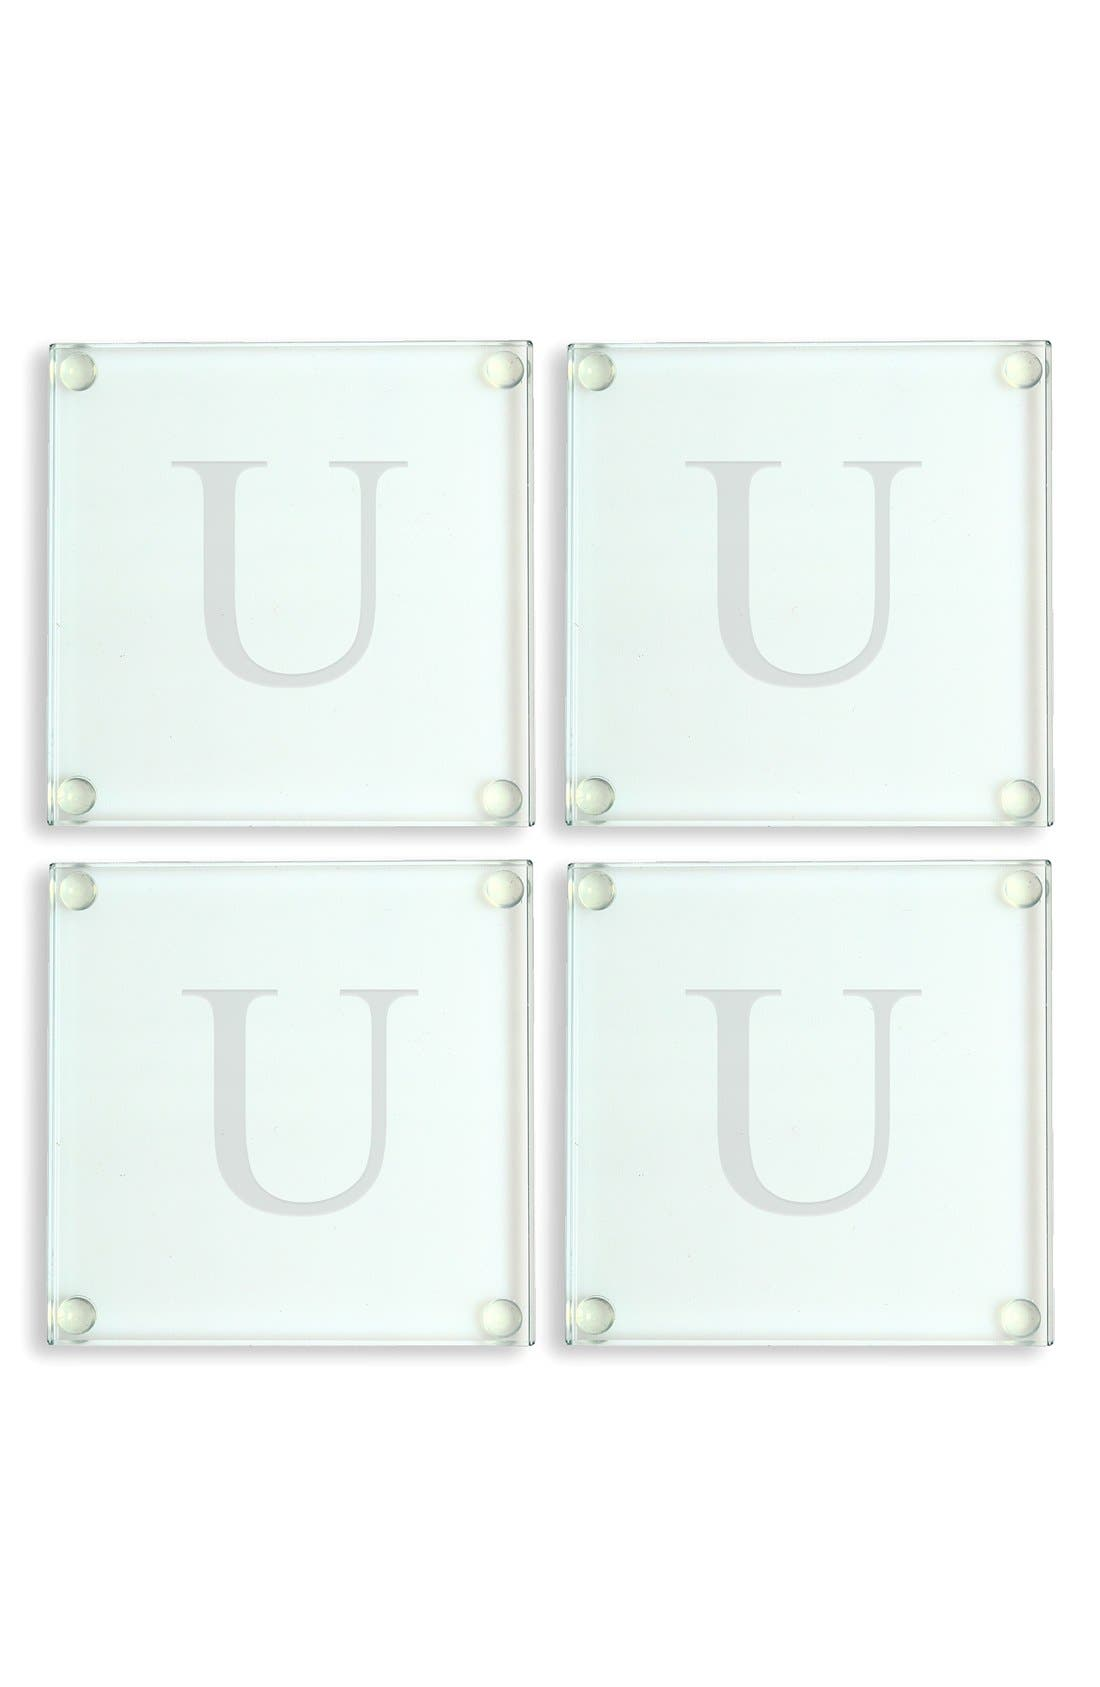 Monogram Glass Coasters,                             Main thumbnail 1, color,                             121